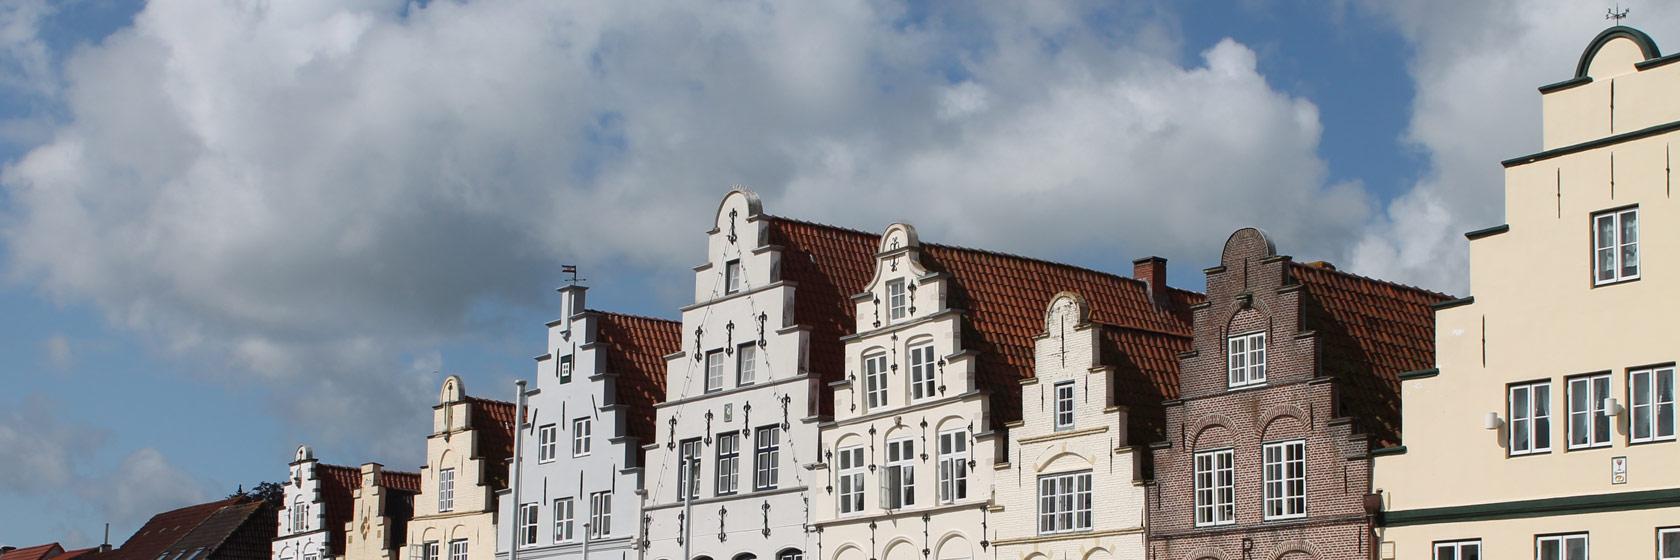 rundrejse-tyskland-friedrichstadt